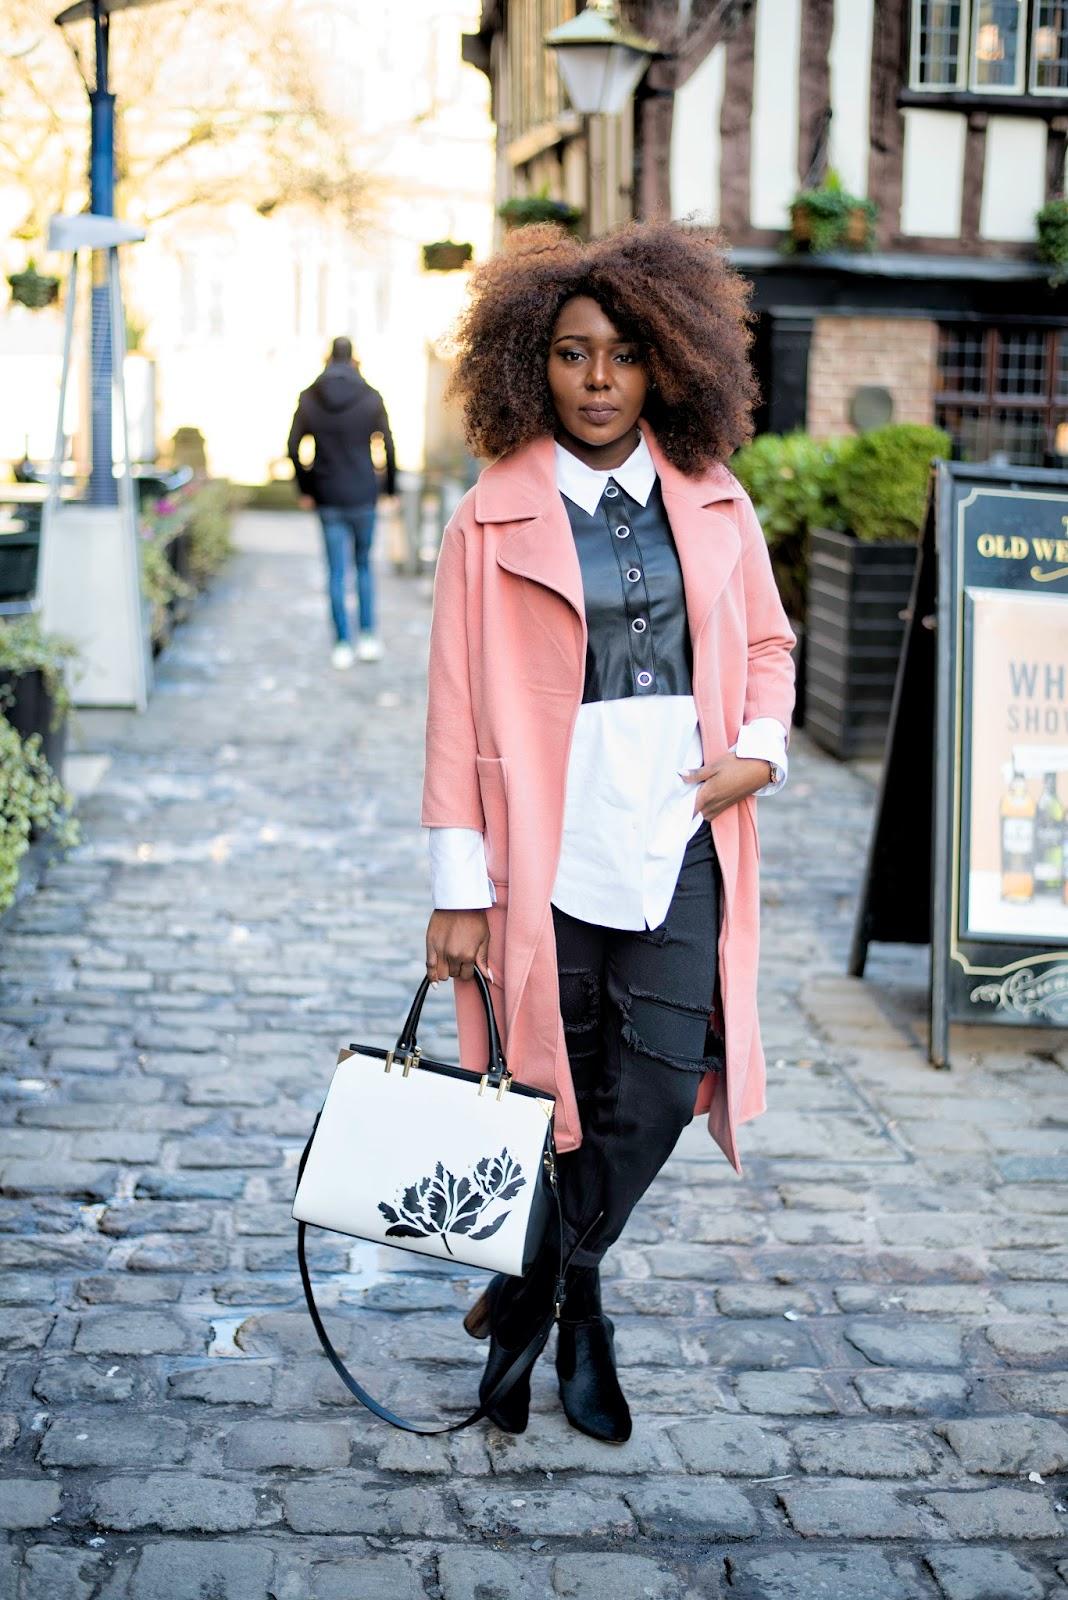 Stephylately | Wearing Boohoo Emeli Collar Coat, boohoo ankle boots and boohoo mum jeans